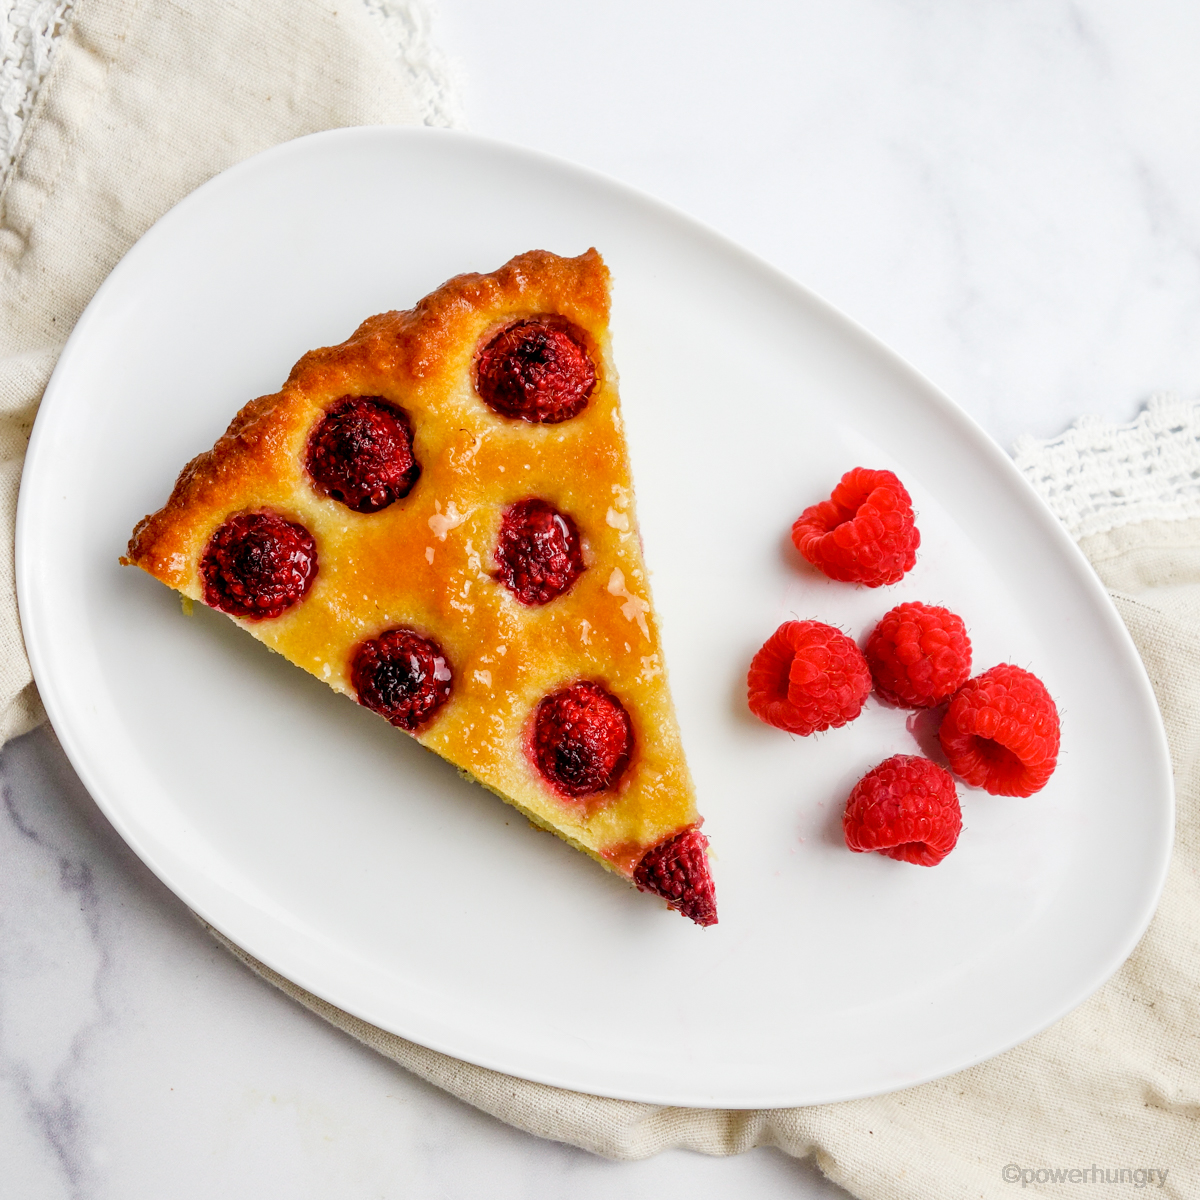 singleslice of vegan no-crust raspberry almond tart on a white plate with fresh raspberries